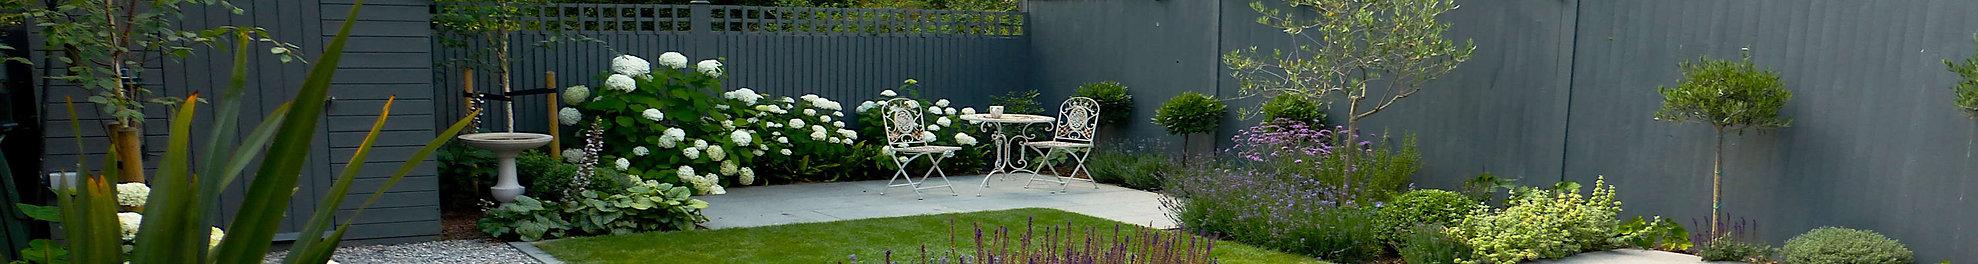 Garden strip.jpg